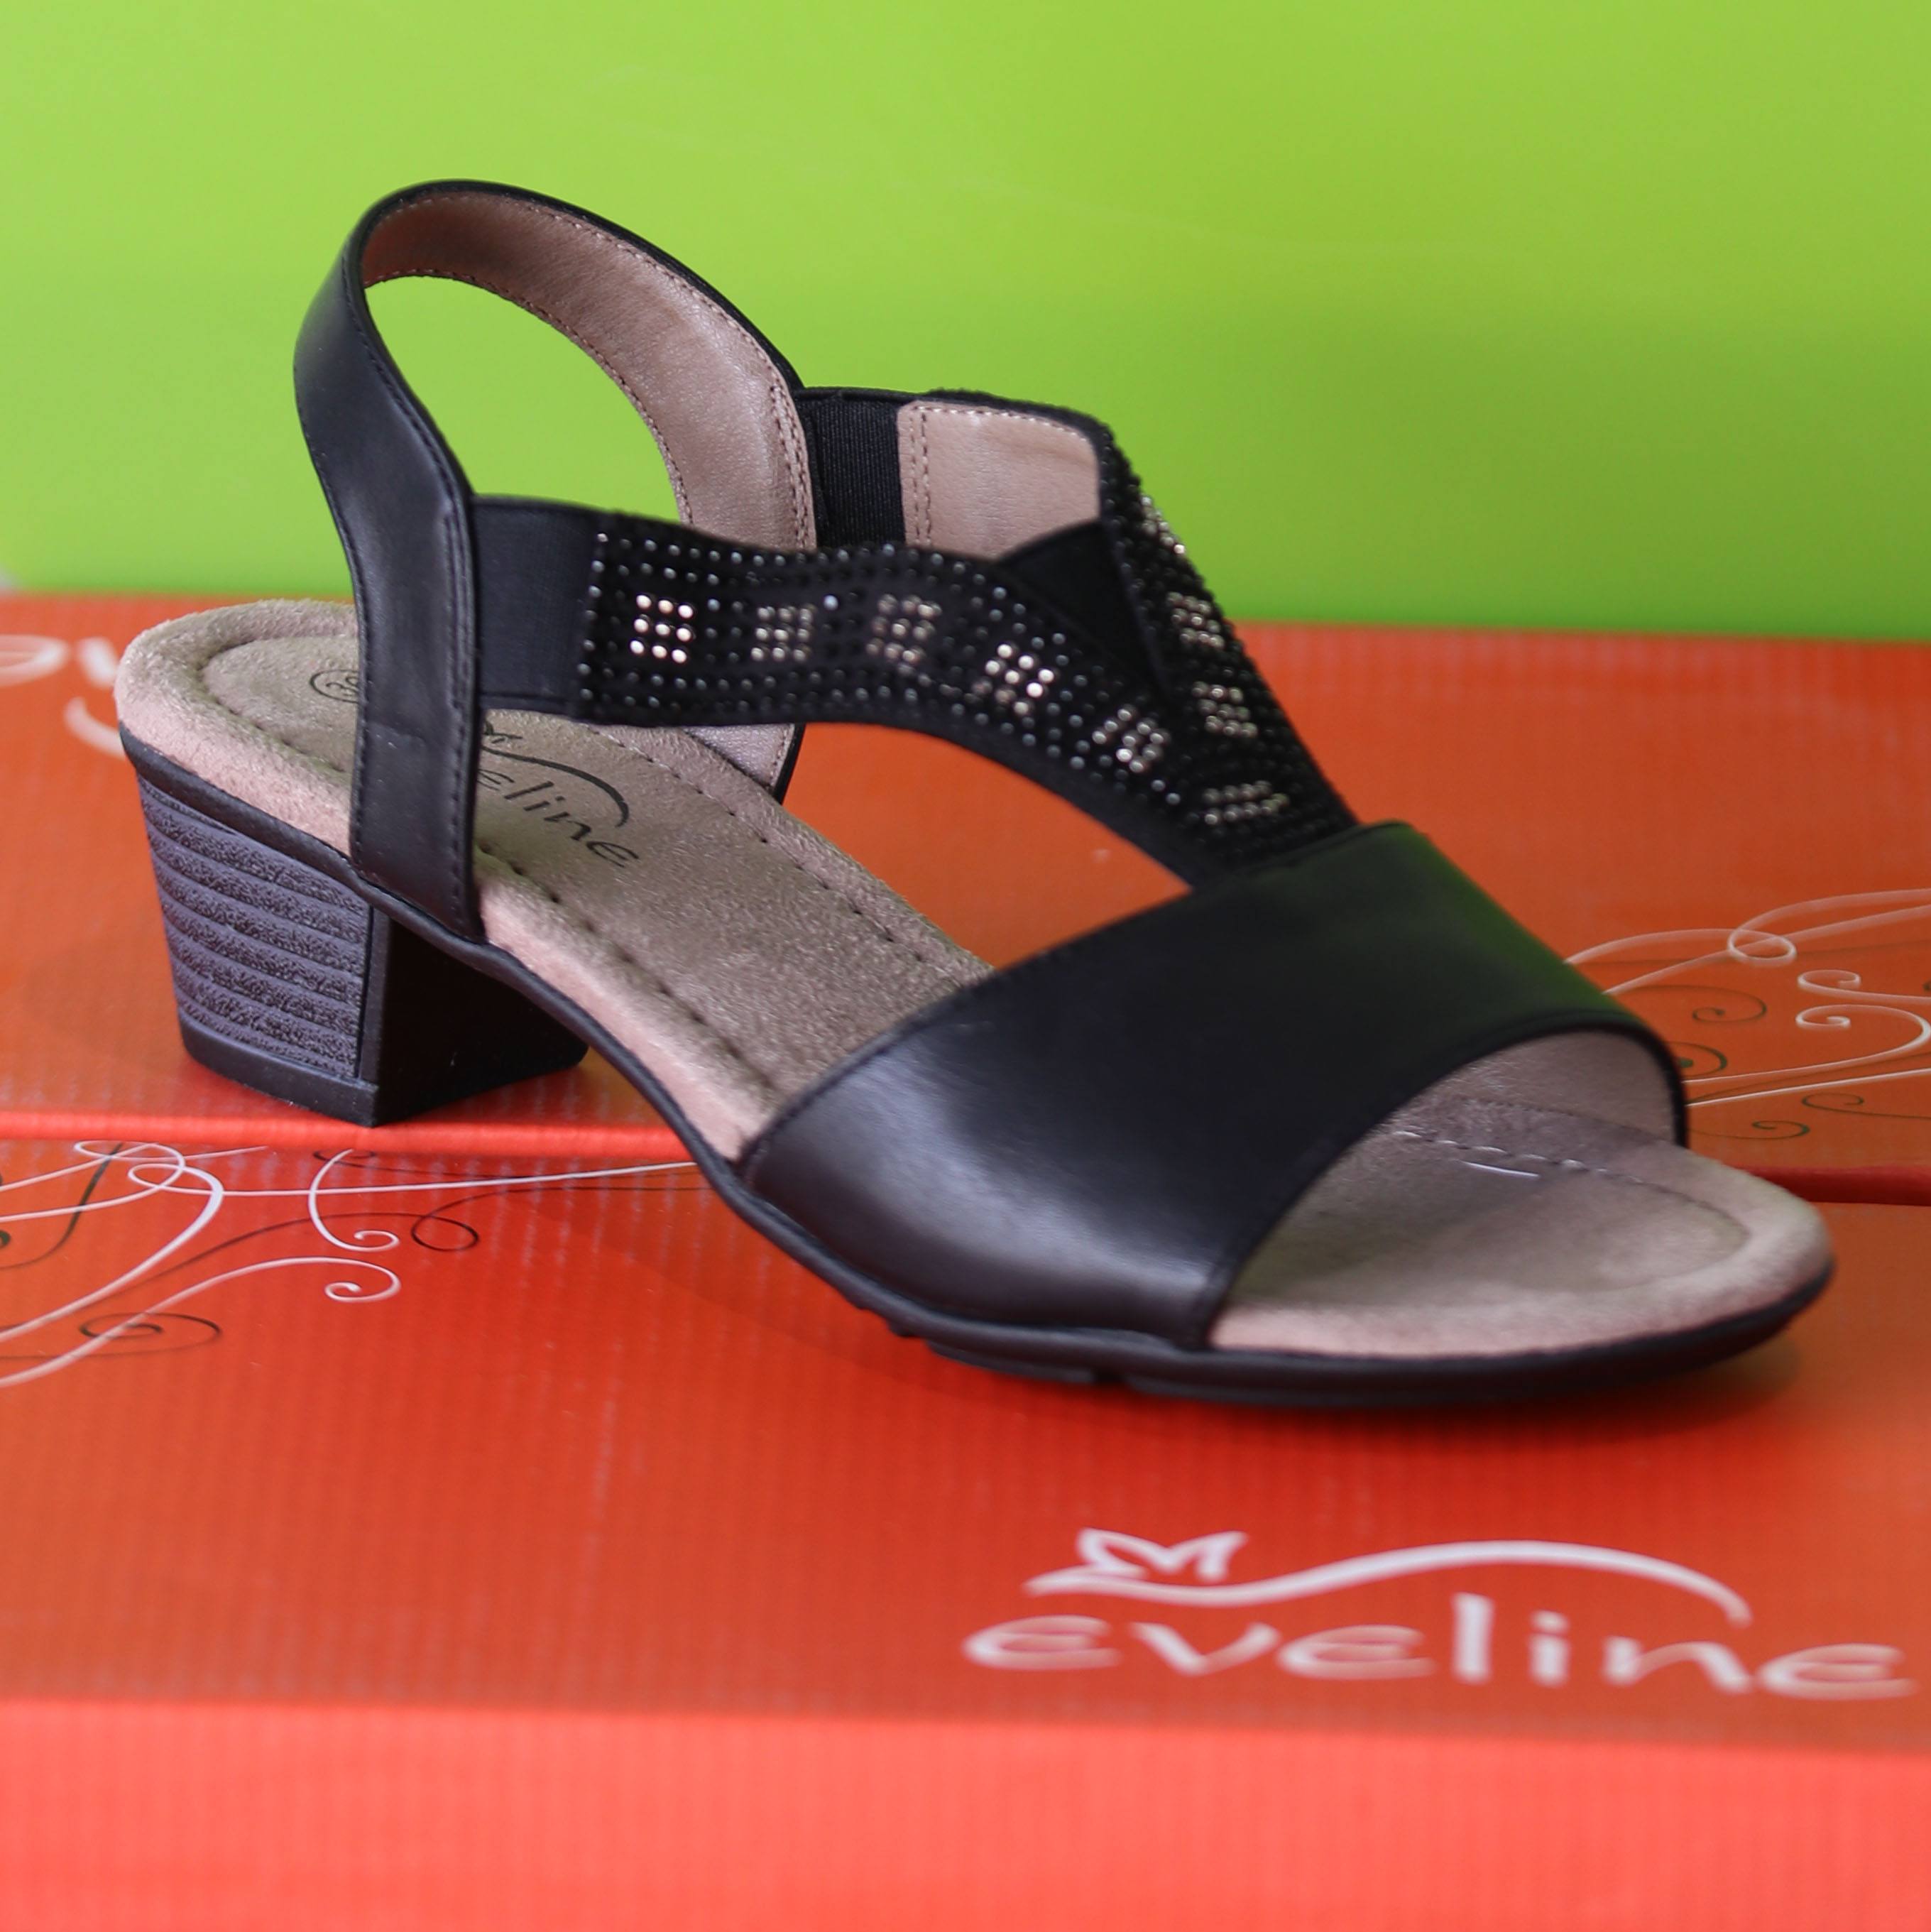 eveline sandal sort sommer dame 2